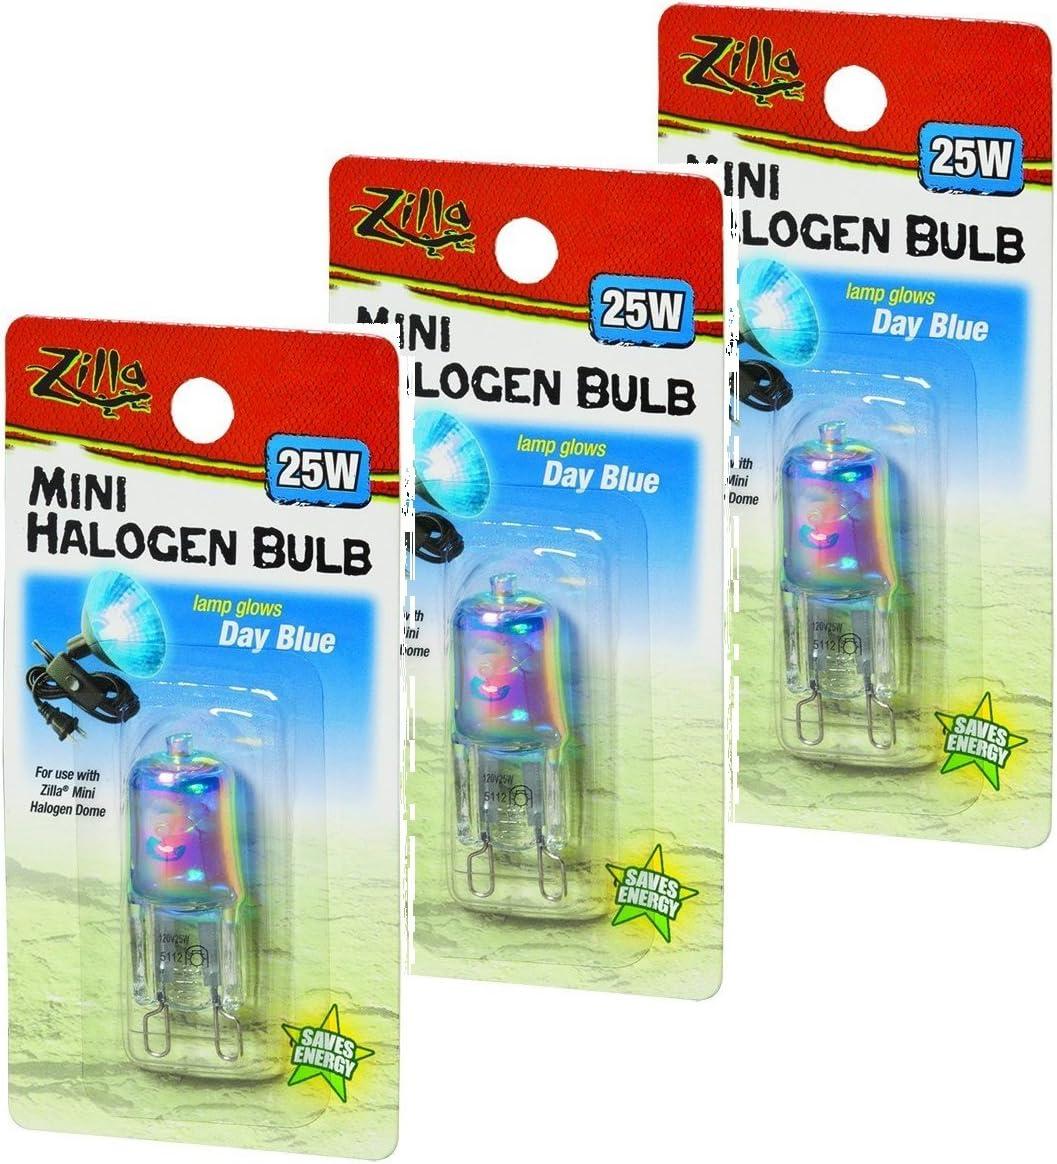 Zilla Mini Halogen Lamp Reptile Bulb, 25-watt, Day Blue (3 Pack)